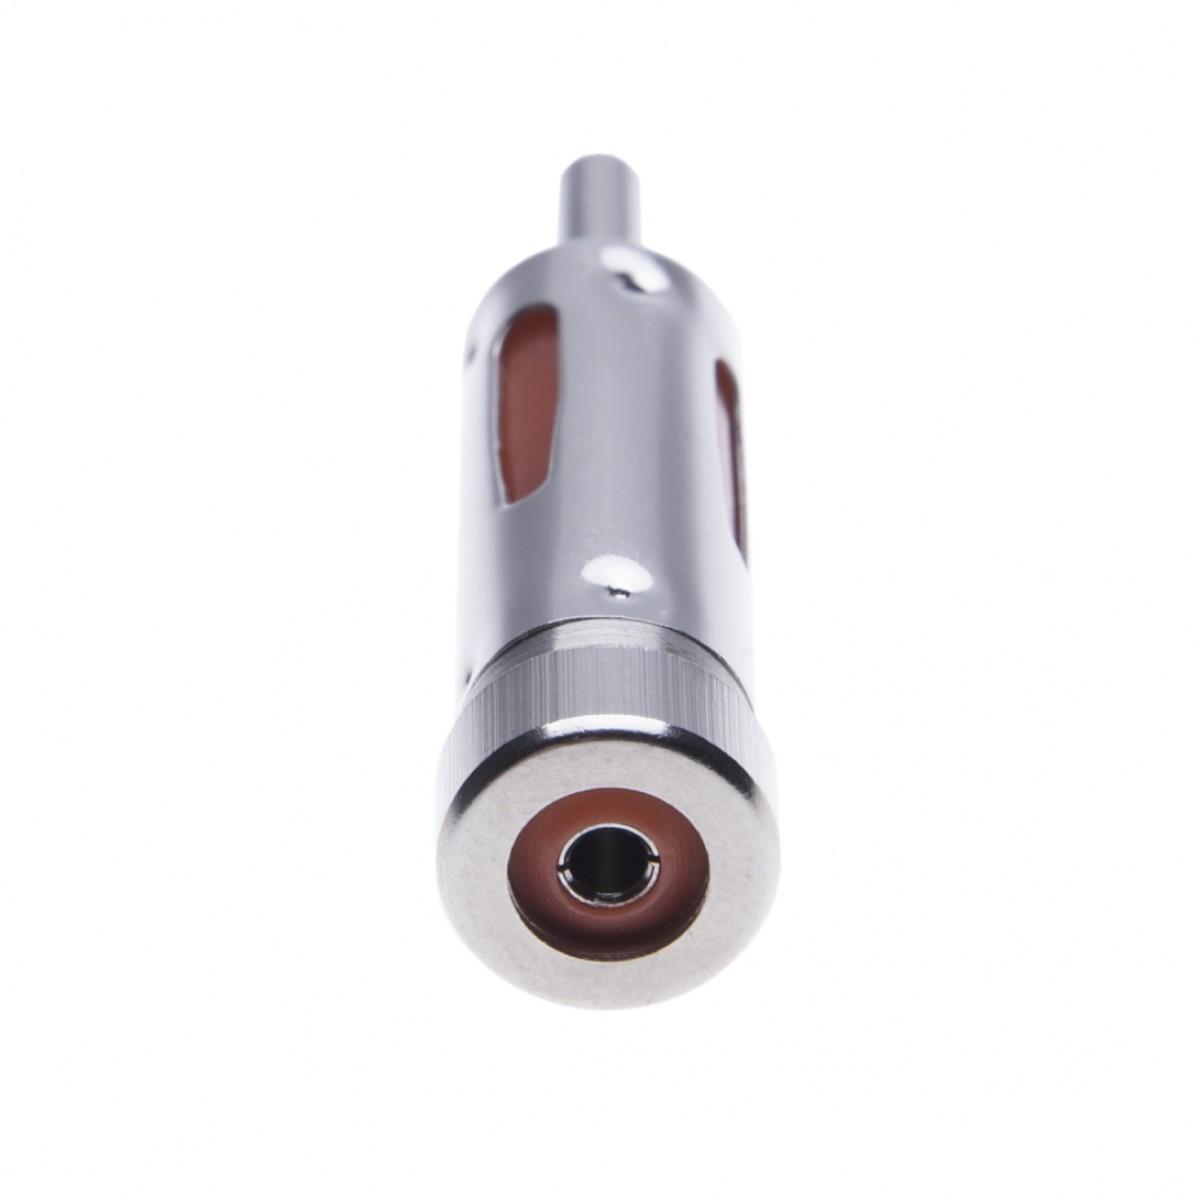 Car Aerial Connector FM Radio Modulator Antenna Adapter European Vehicle DIN ISO